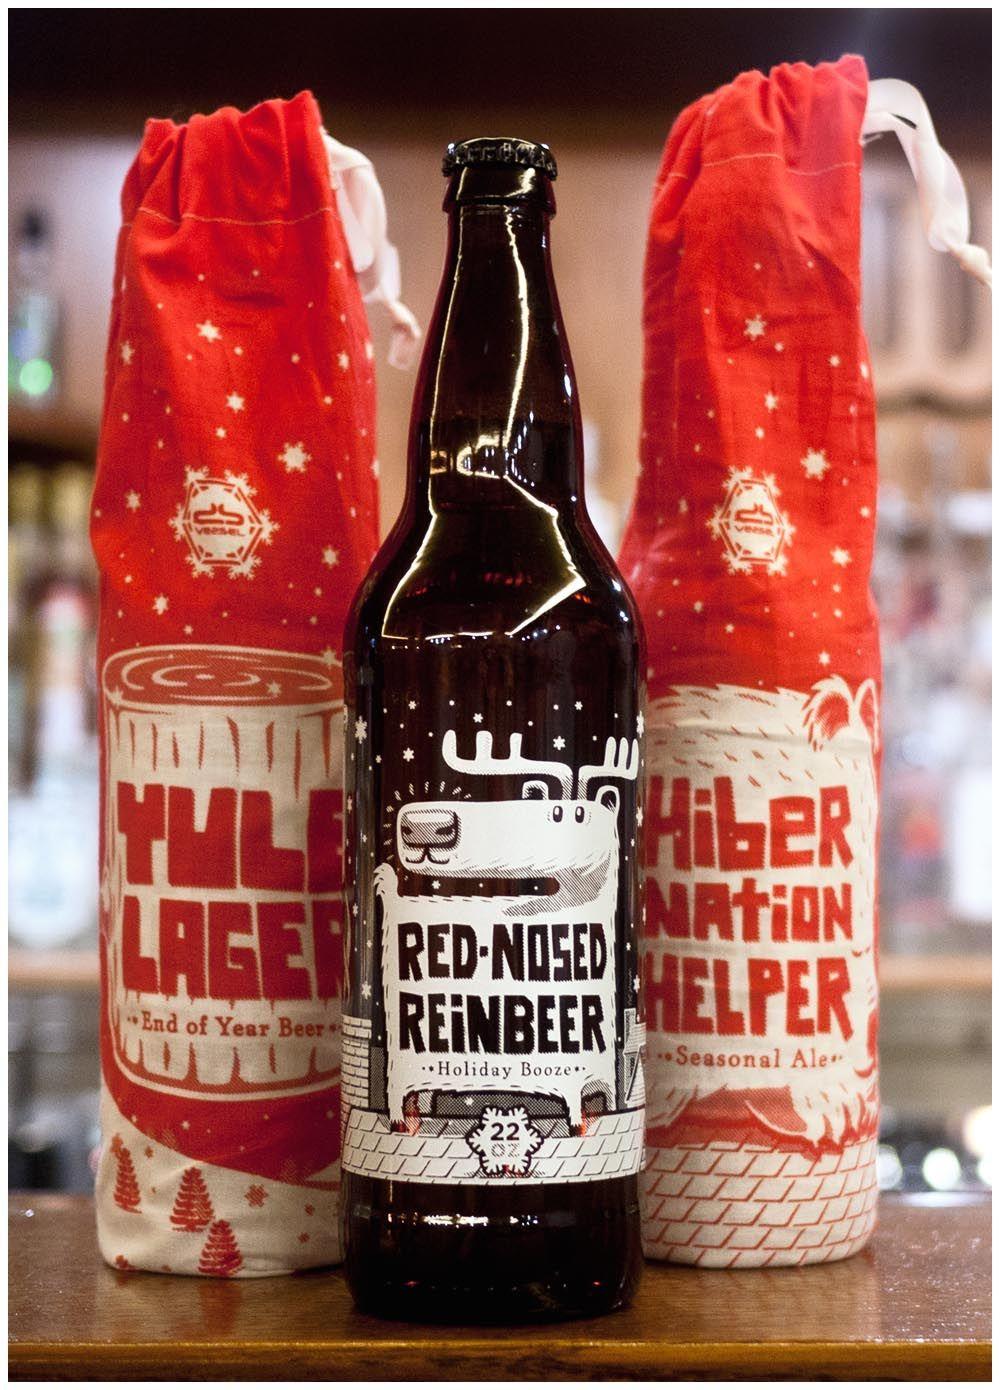 Design Image By Nanitaw Beer Label Design Beautiful Beer Labels Holiday Beer